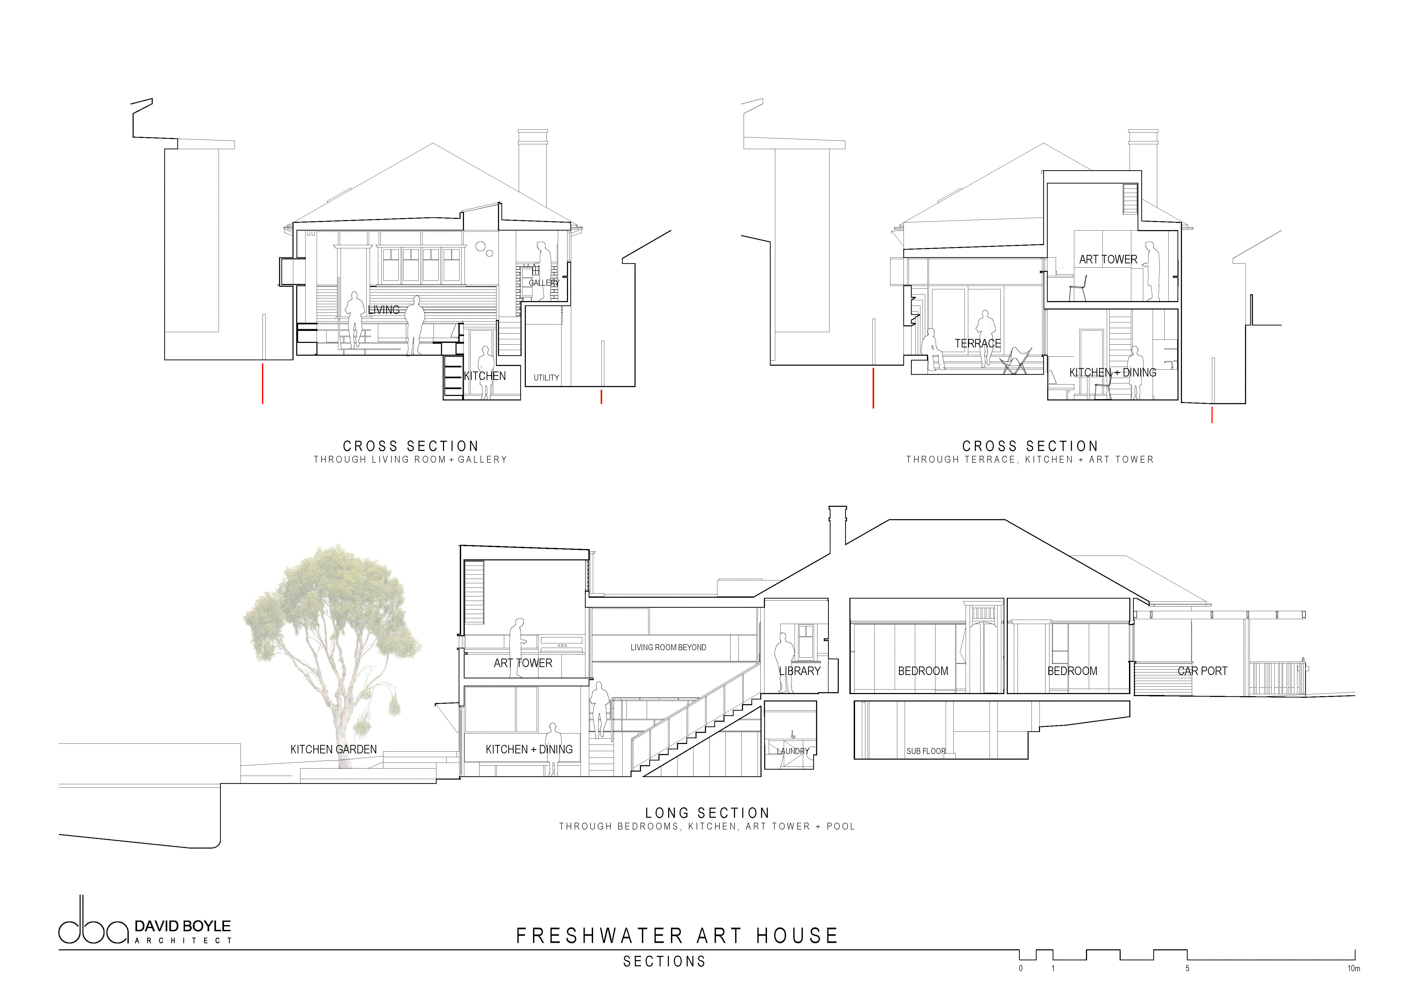 freshwater-art-house-david-boyle-architect-australian-architecture-the-design-emotive-24.jpg